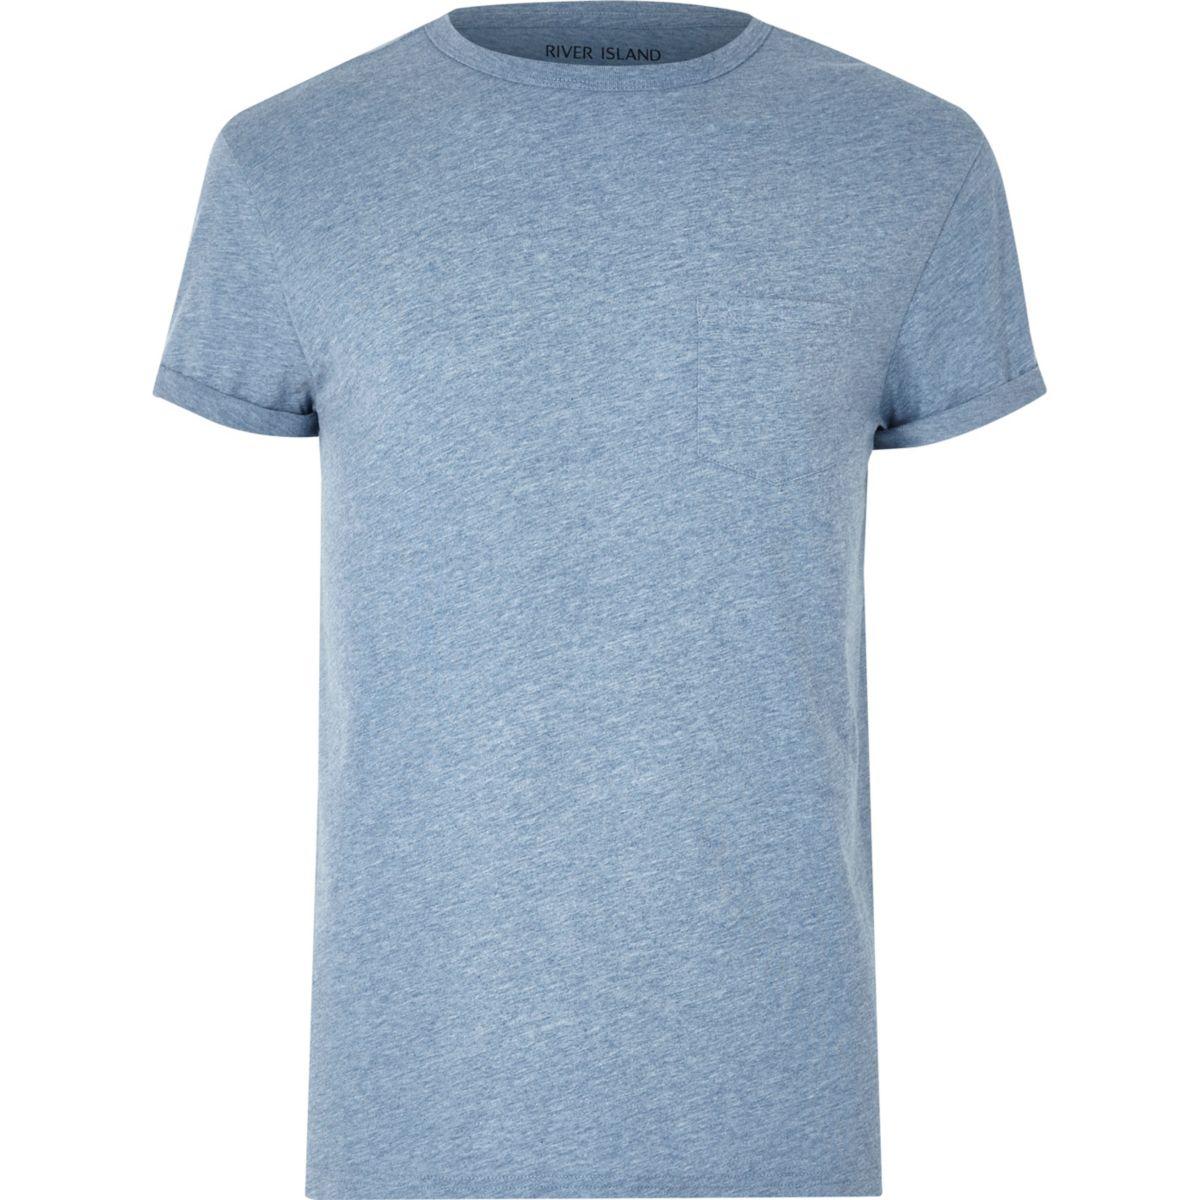 T-shirt bleu chiné avec poche